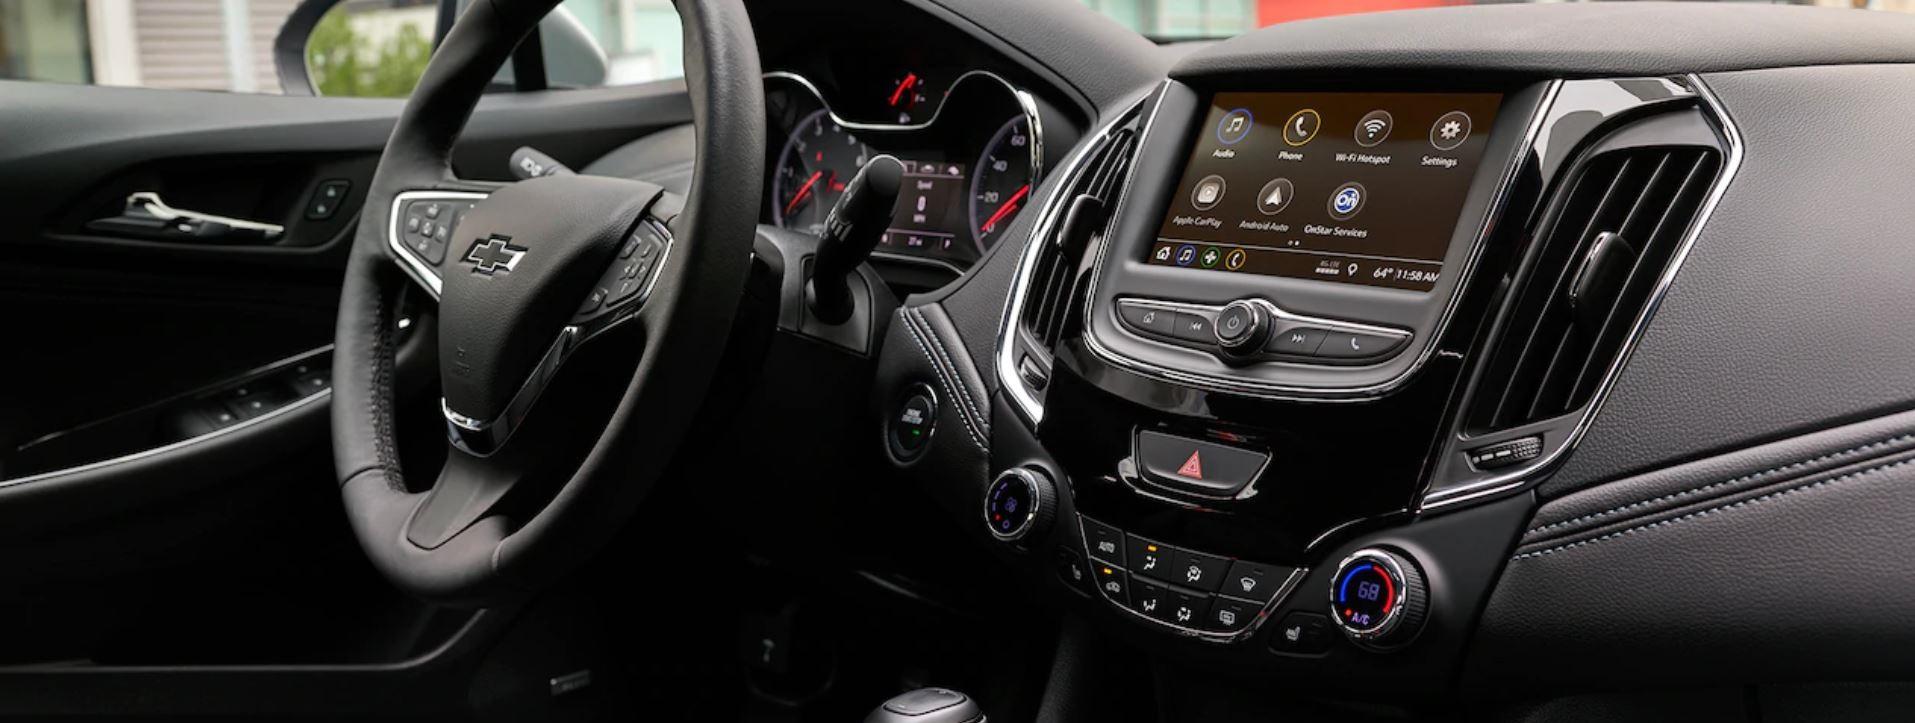 2019 Chevrolet Cruze Dashboard